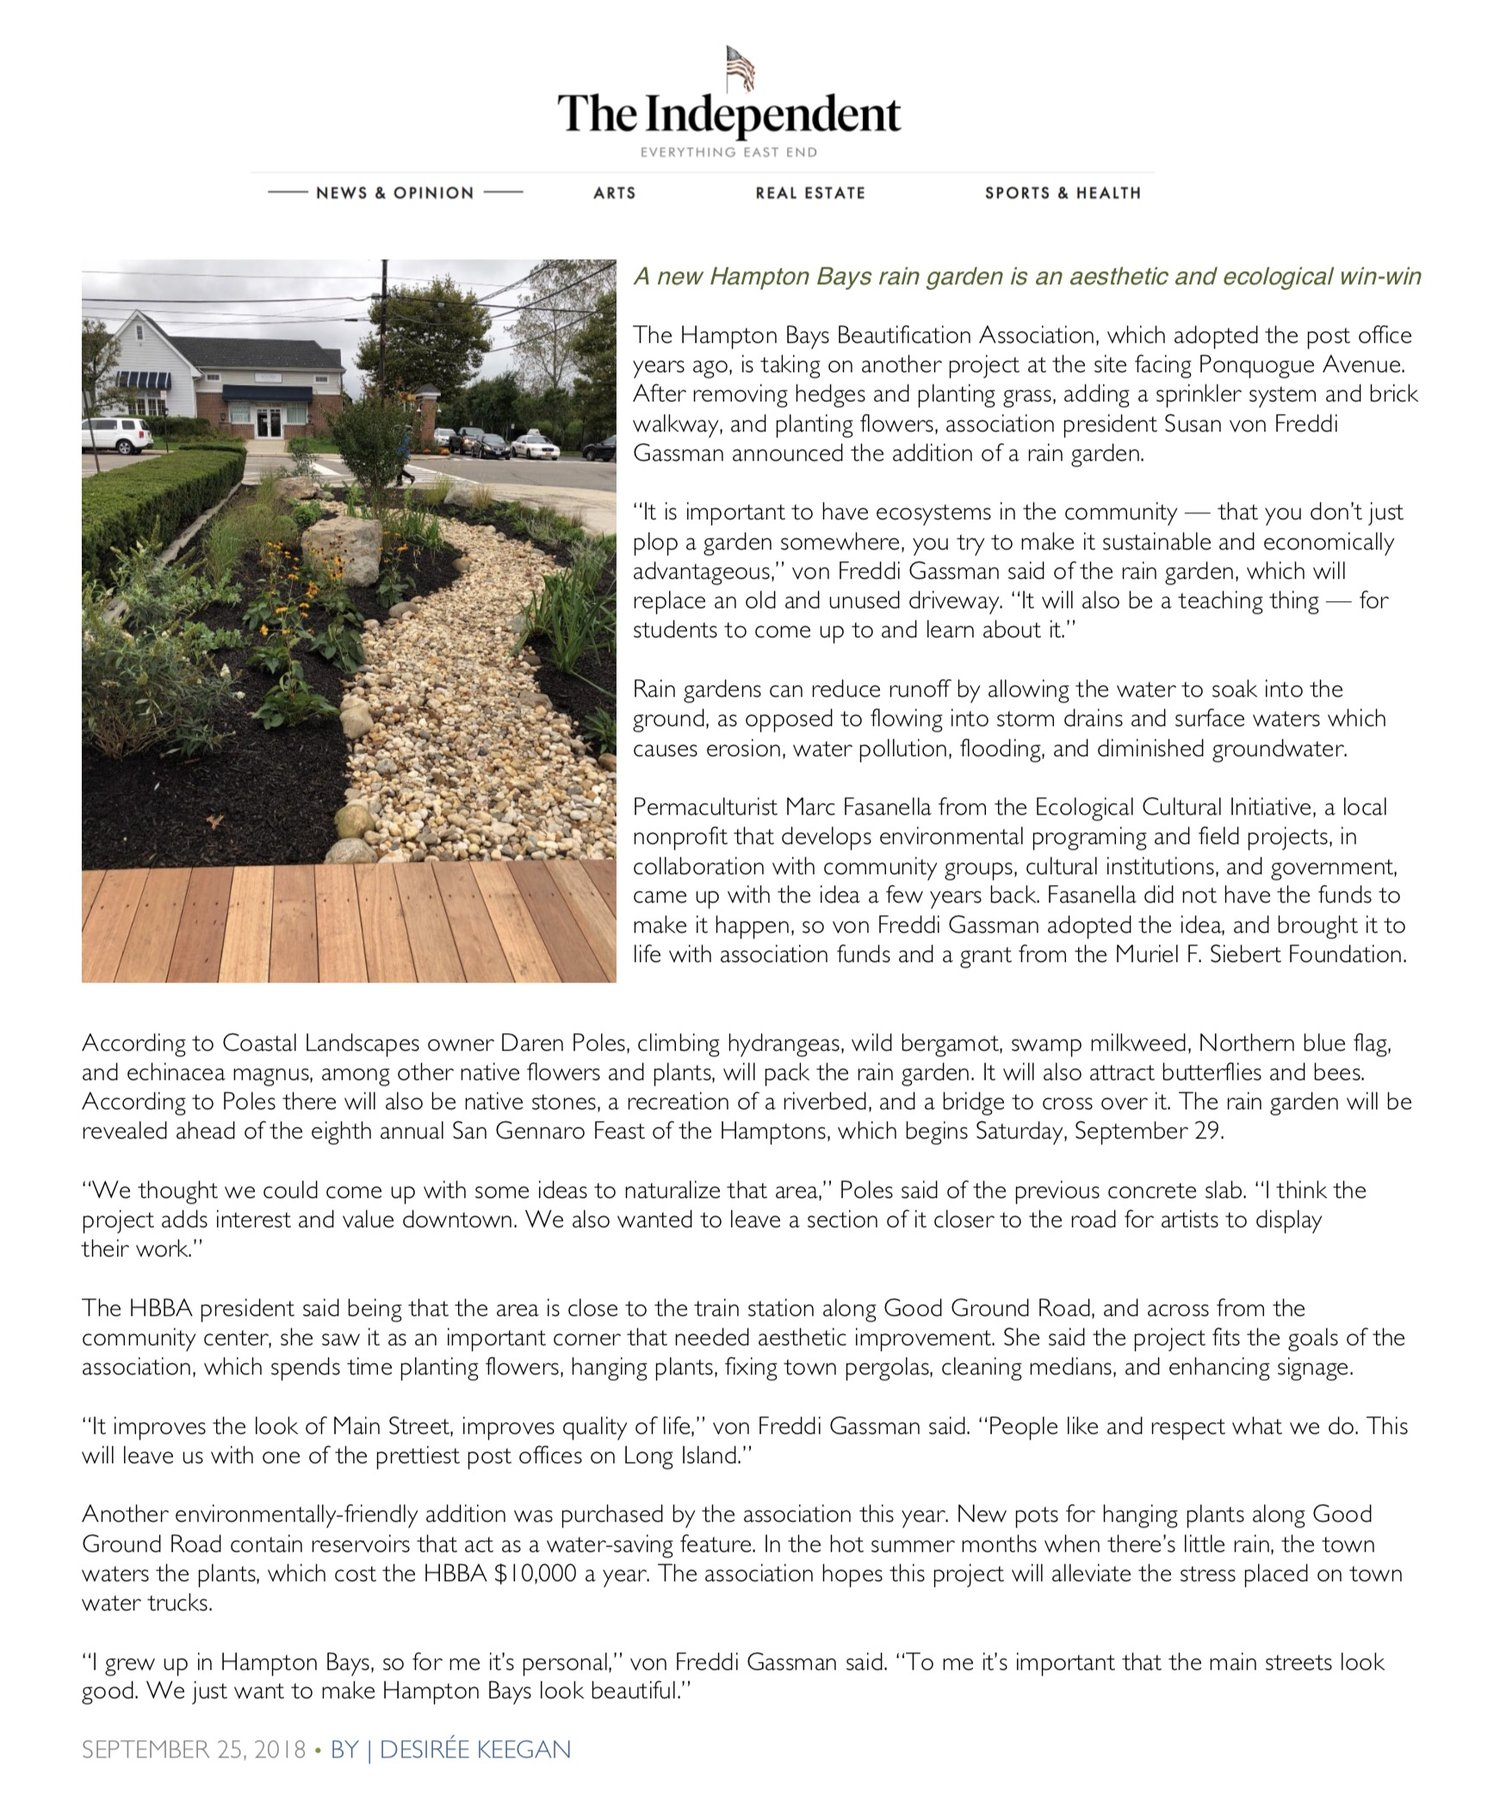 A new Hampton Bays rain garden is an aesthetic and